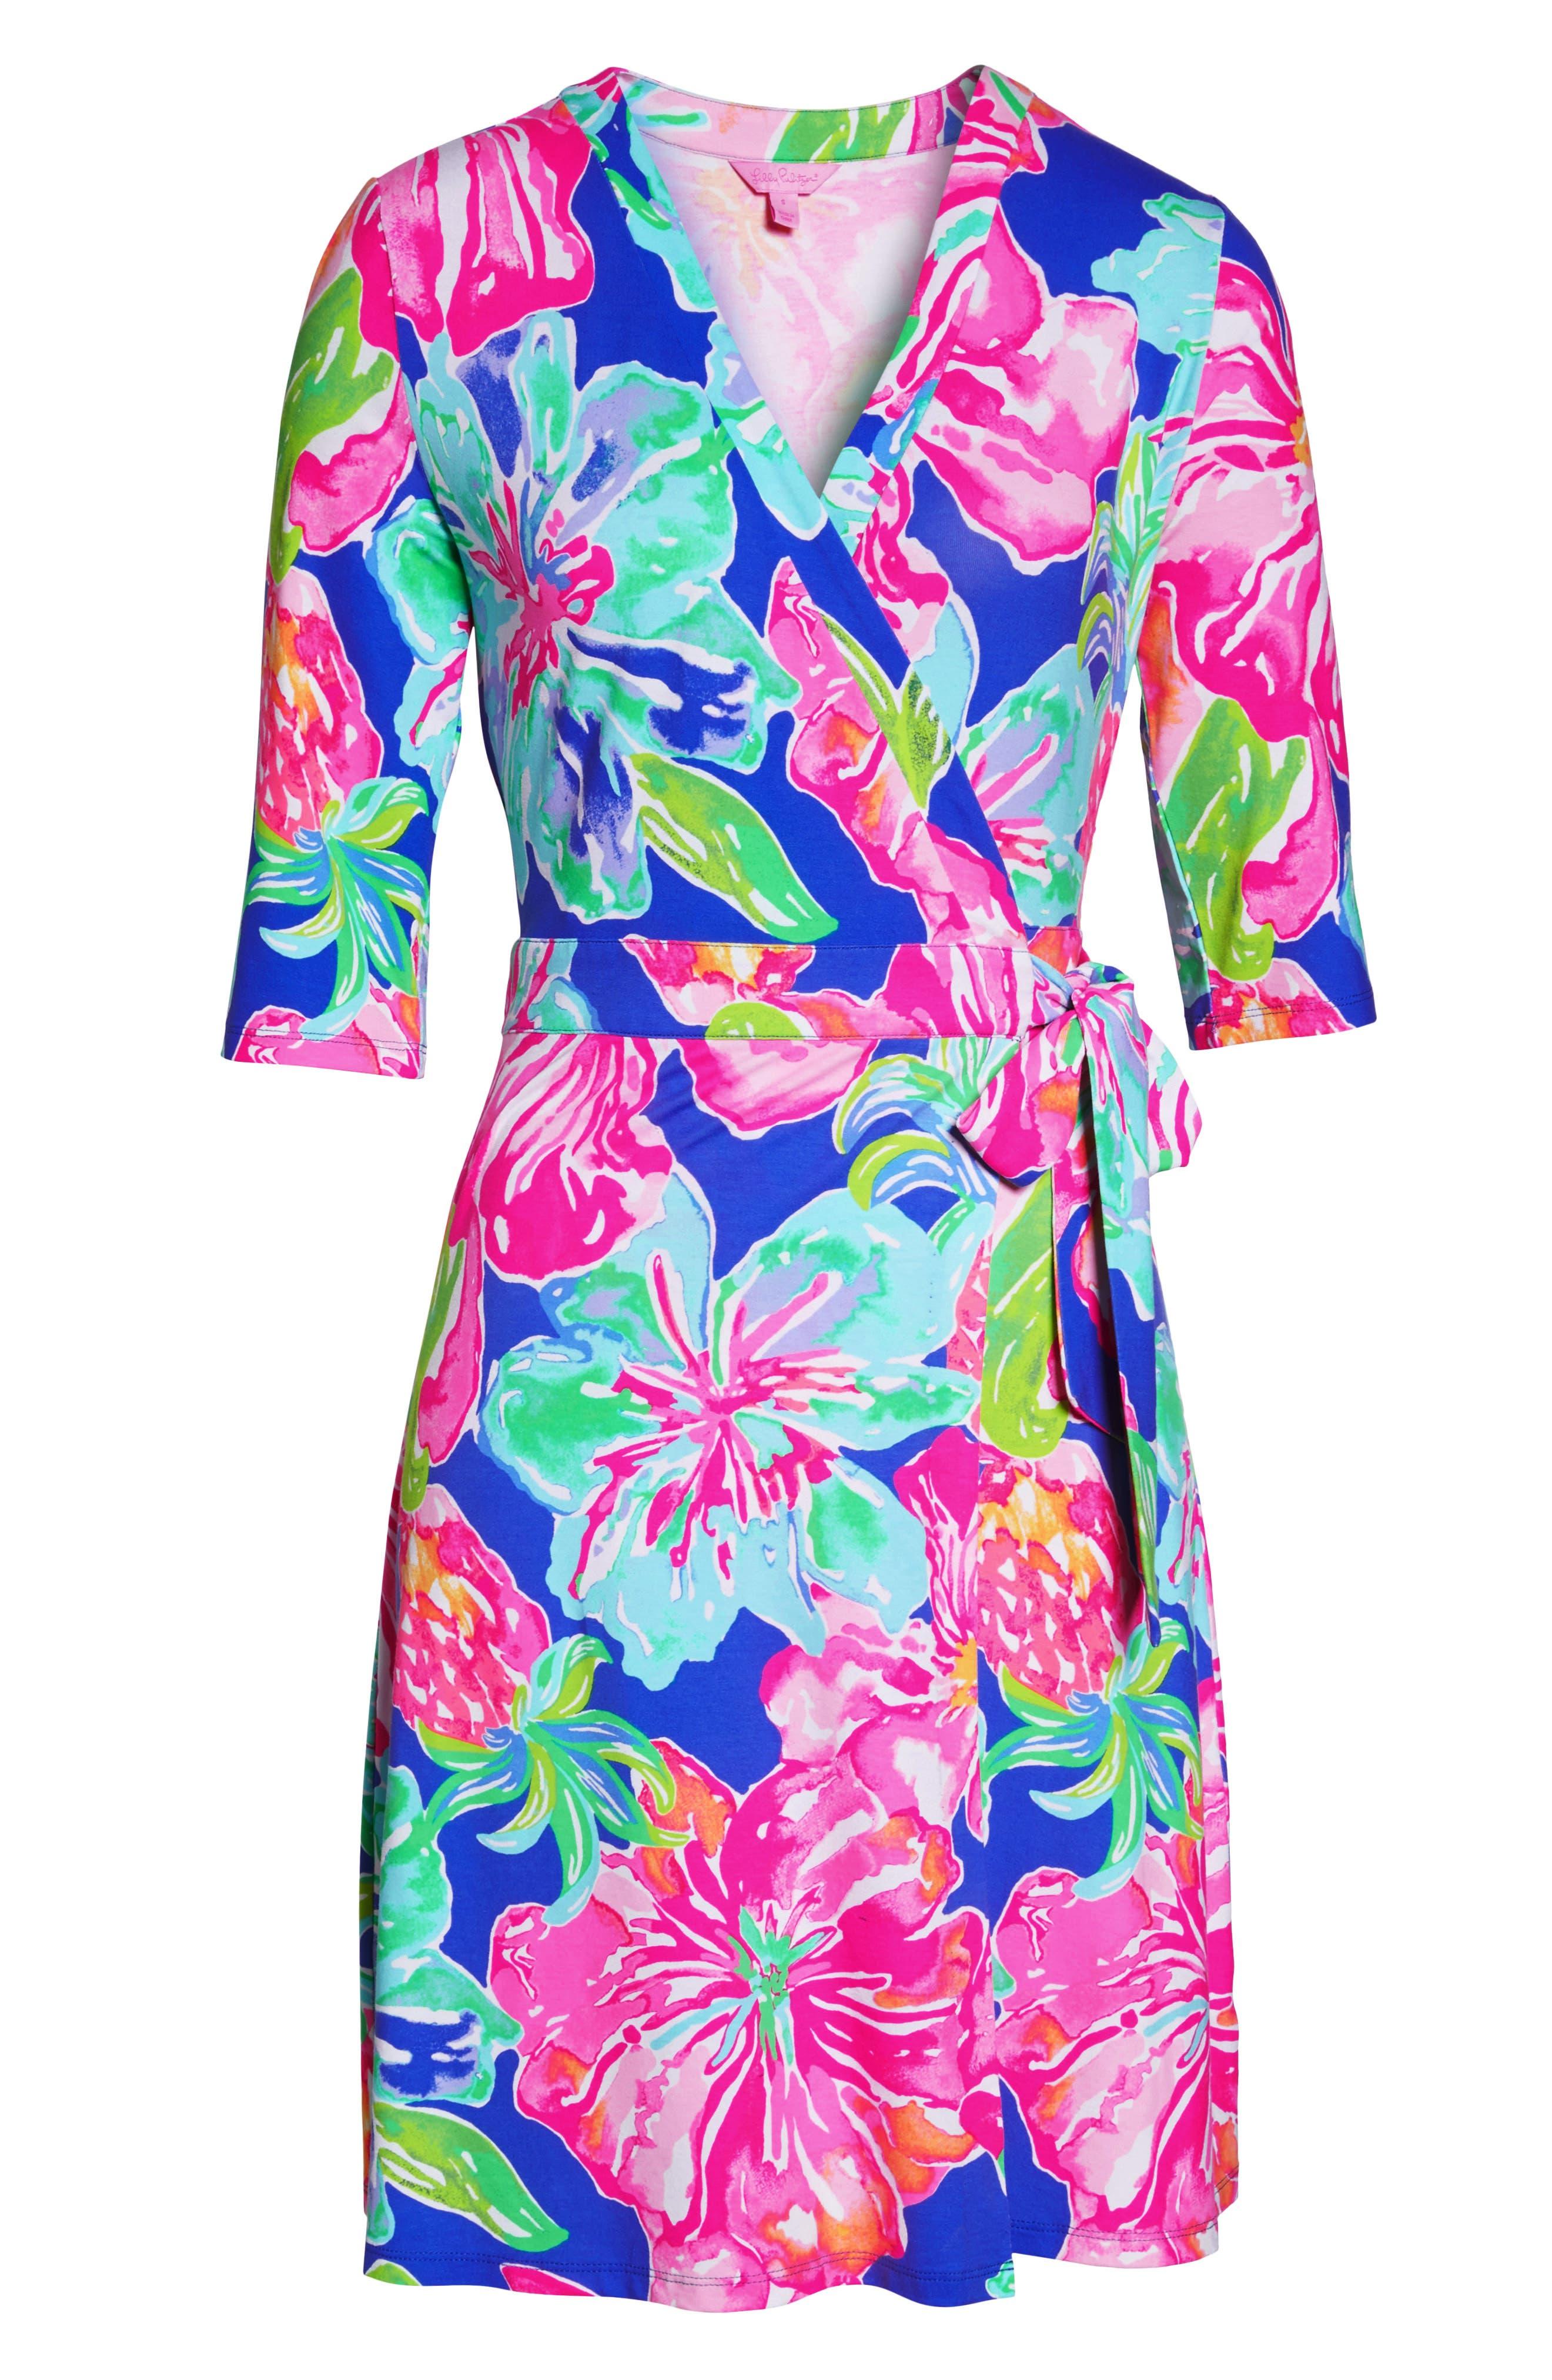 Marvista Wrap Dress,                             Alternate thumbnail 6, color,                             Beckon Blue Jungle Utopia